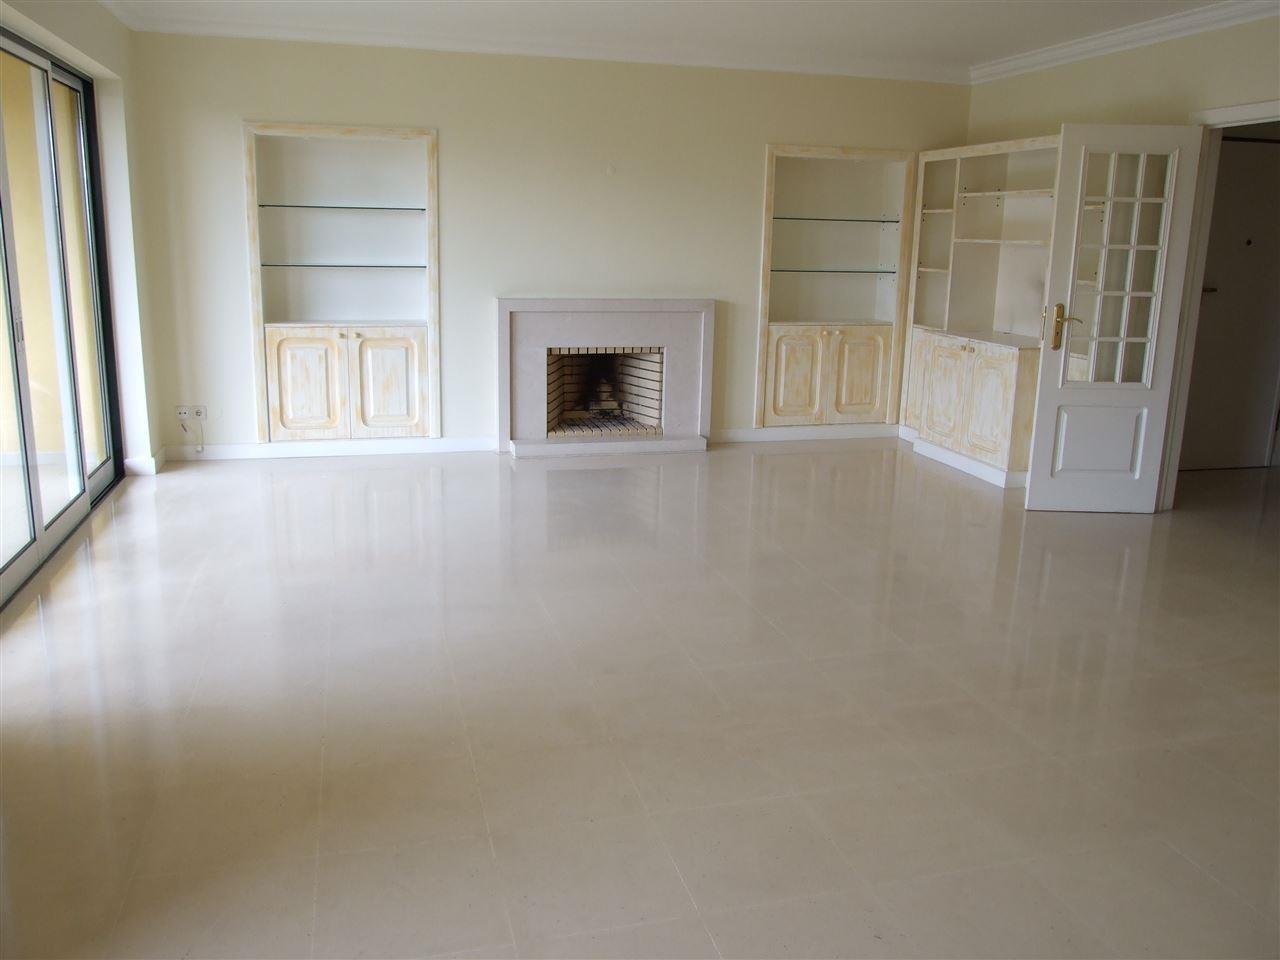 Квартира для того Продажа на Flat, 3 bedrooms, for Sale Cascais, Лиссабон Португалия